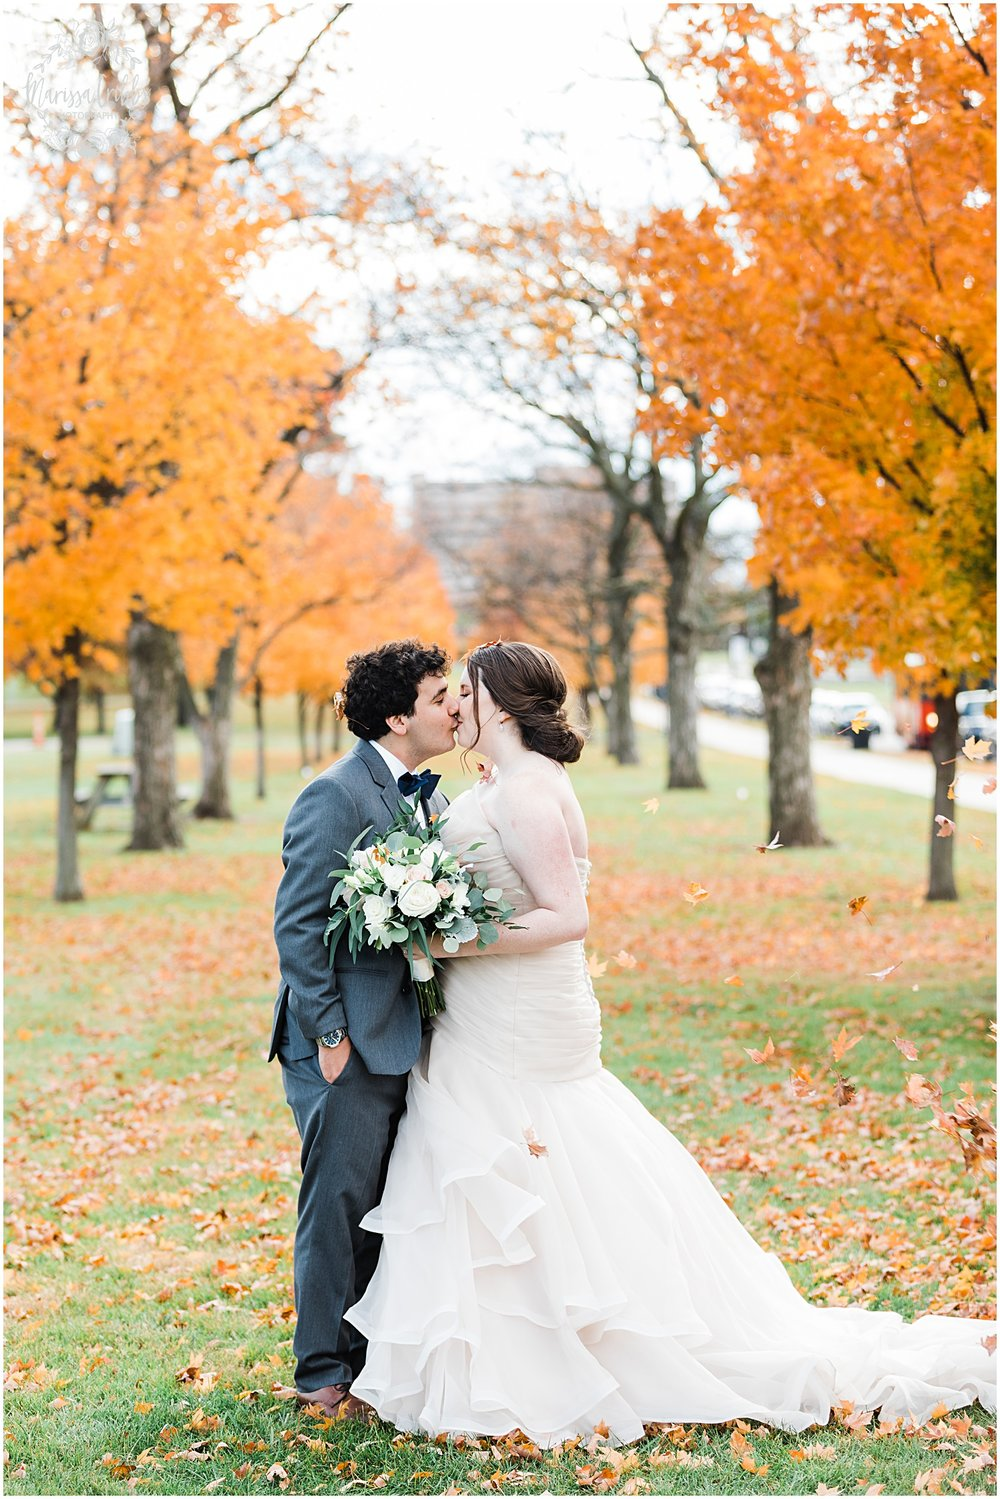 JULIA & AUSTIN MADRID THEATRE WEDDING | MARISSA CRIBBS PHOTOGRAPHY_7117.jpg